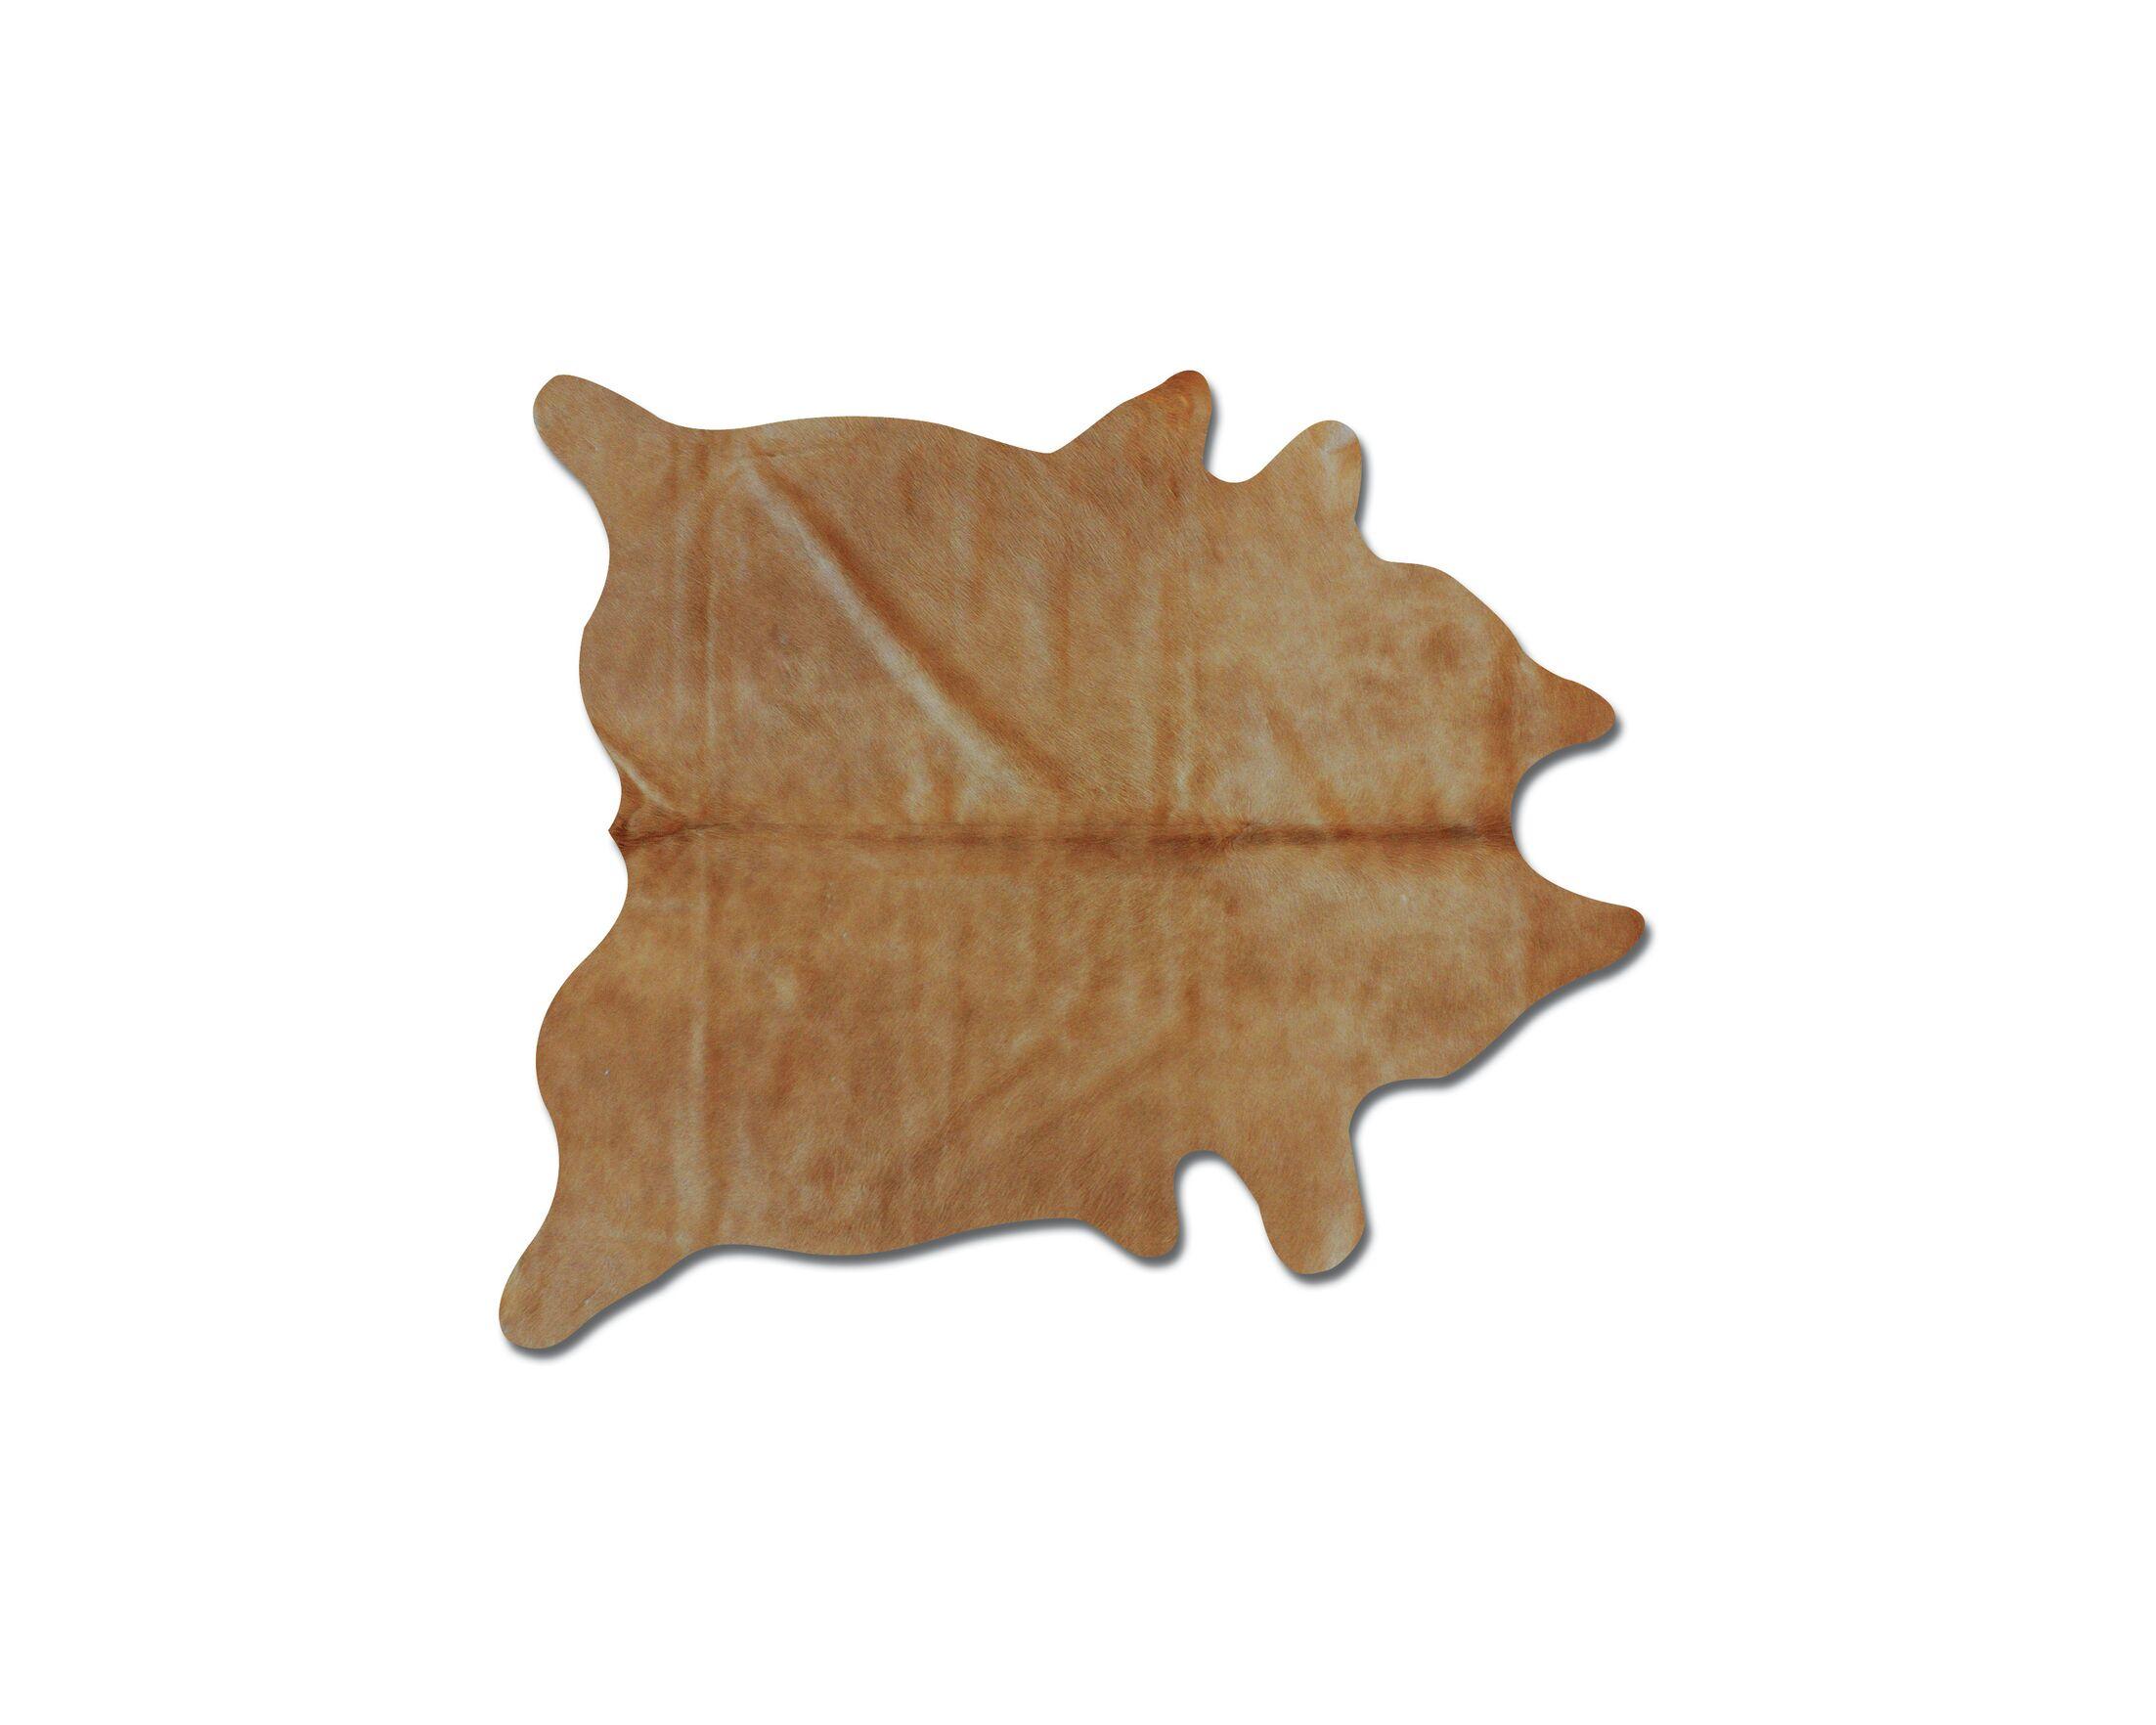 Plainsboro Hand-Woven Cowhide Tan Area Rug